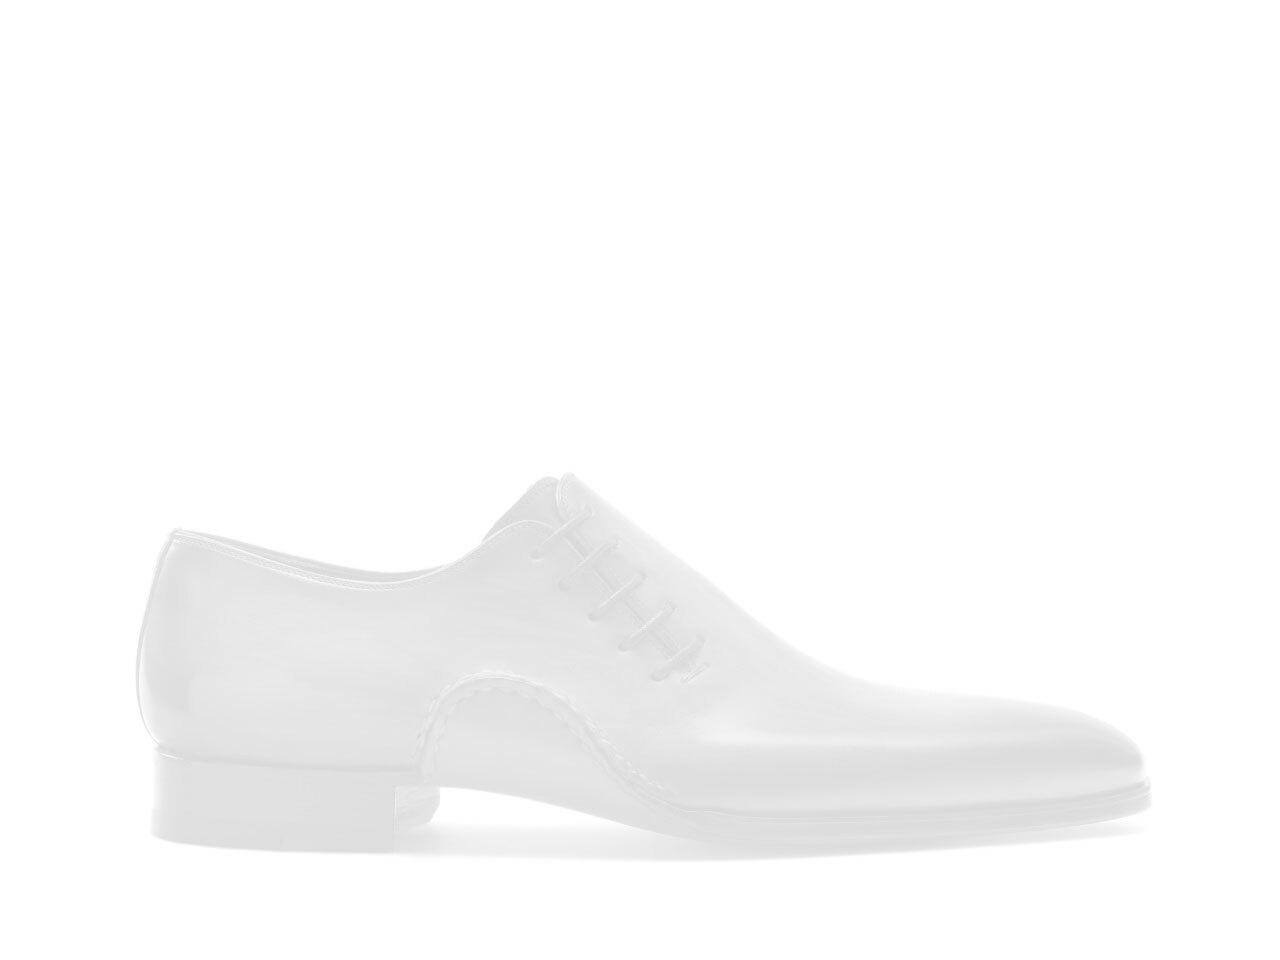 Pair of Magnanni Classic Boot Lace Black Dress Shoe Laces